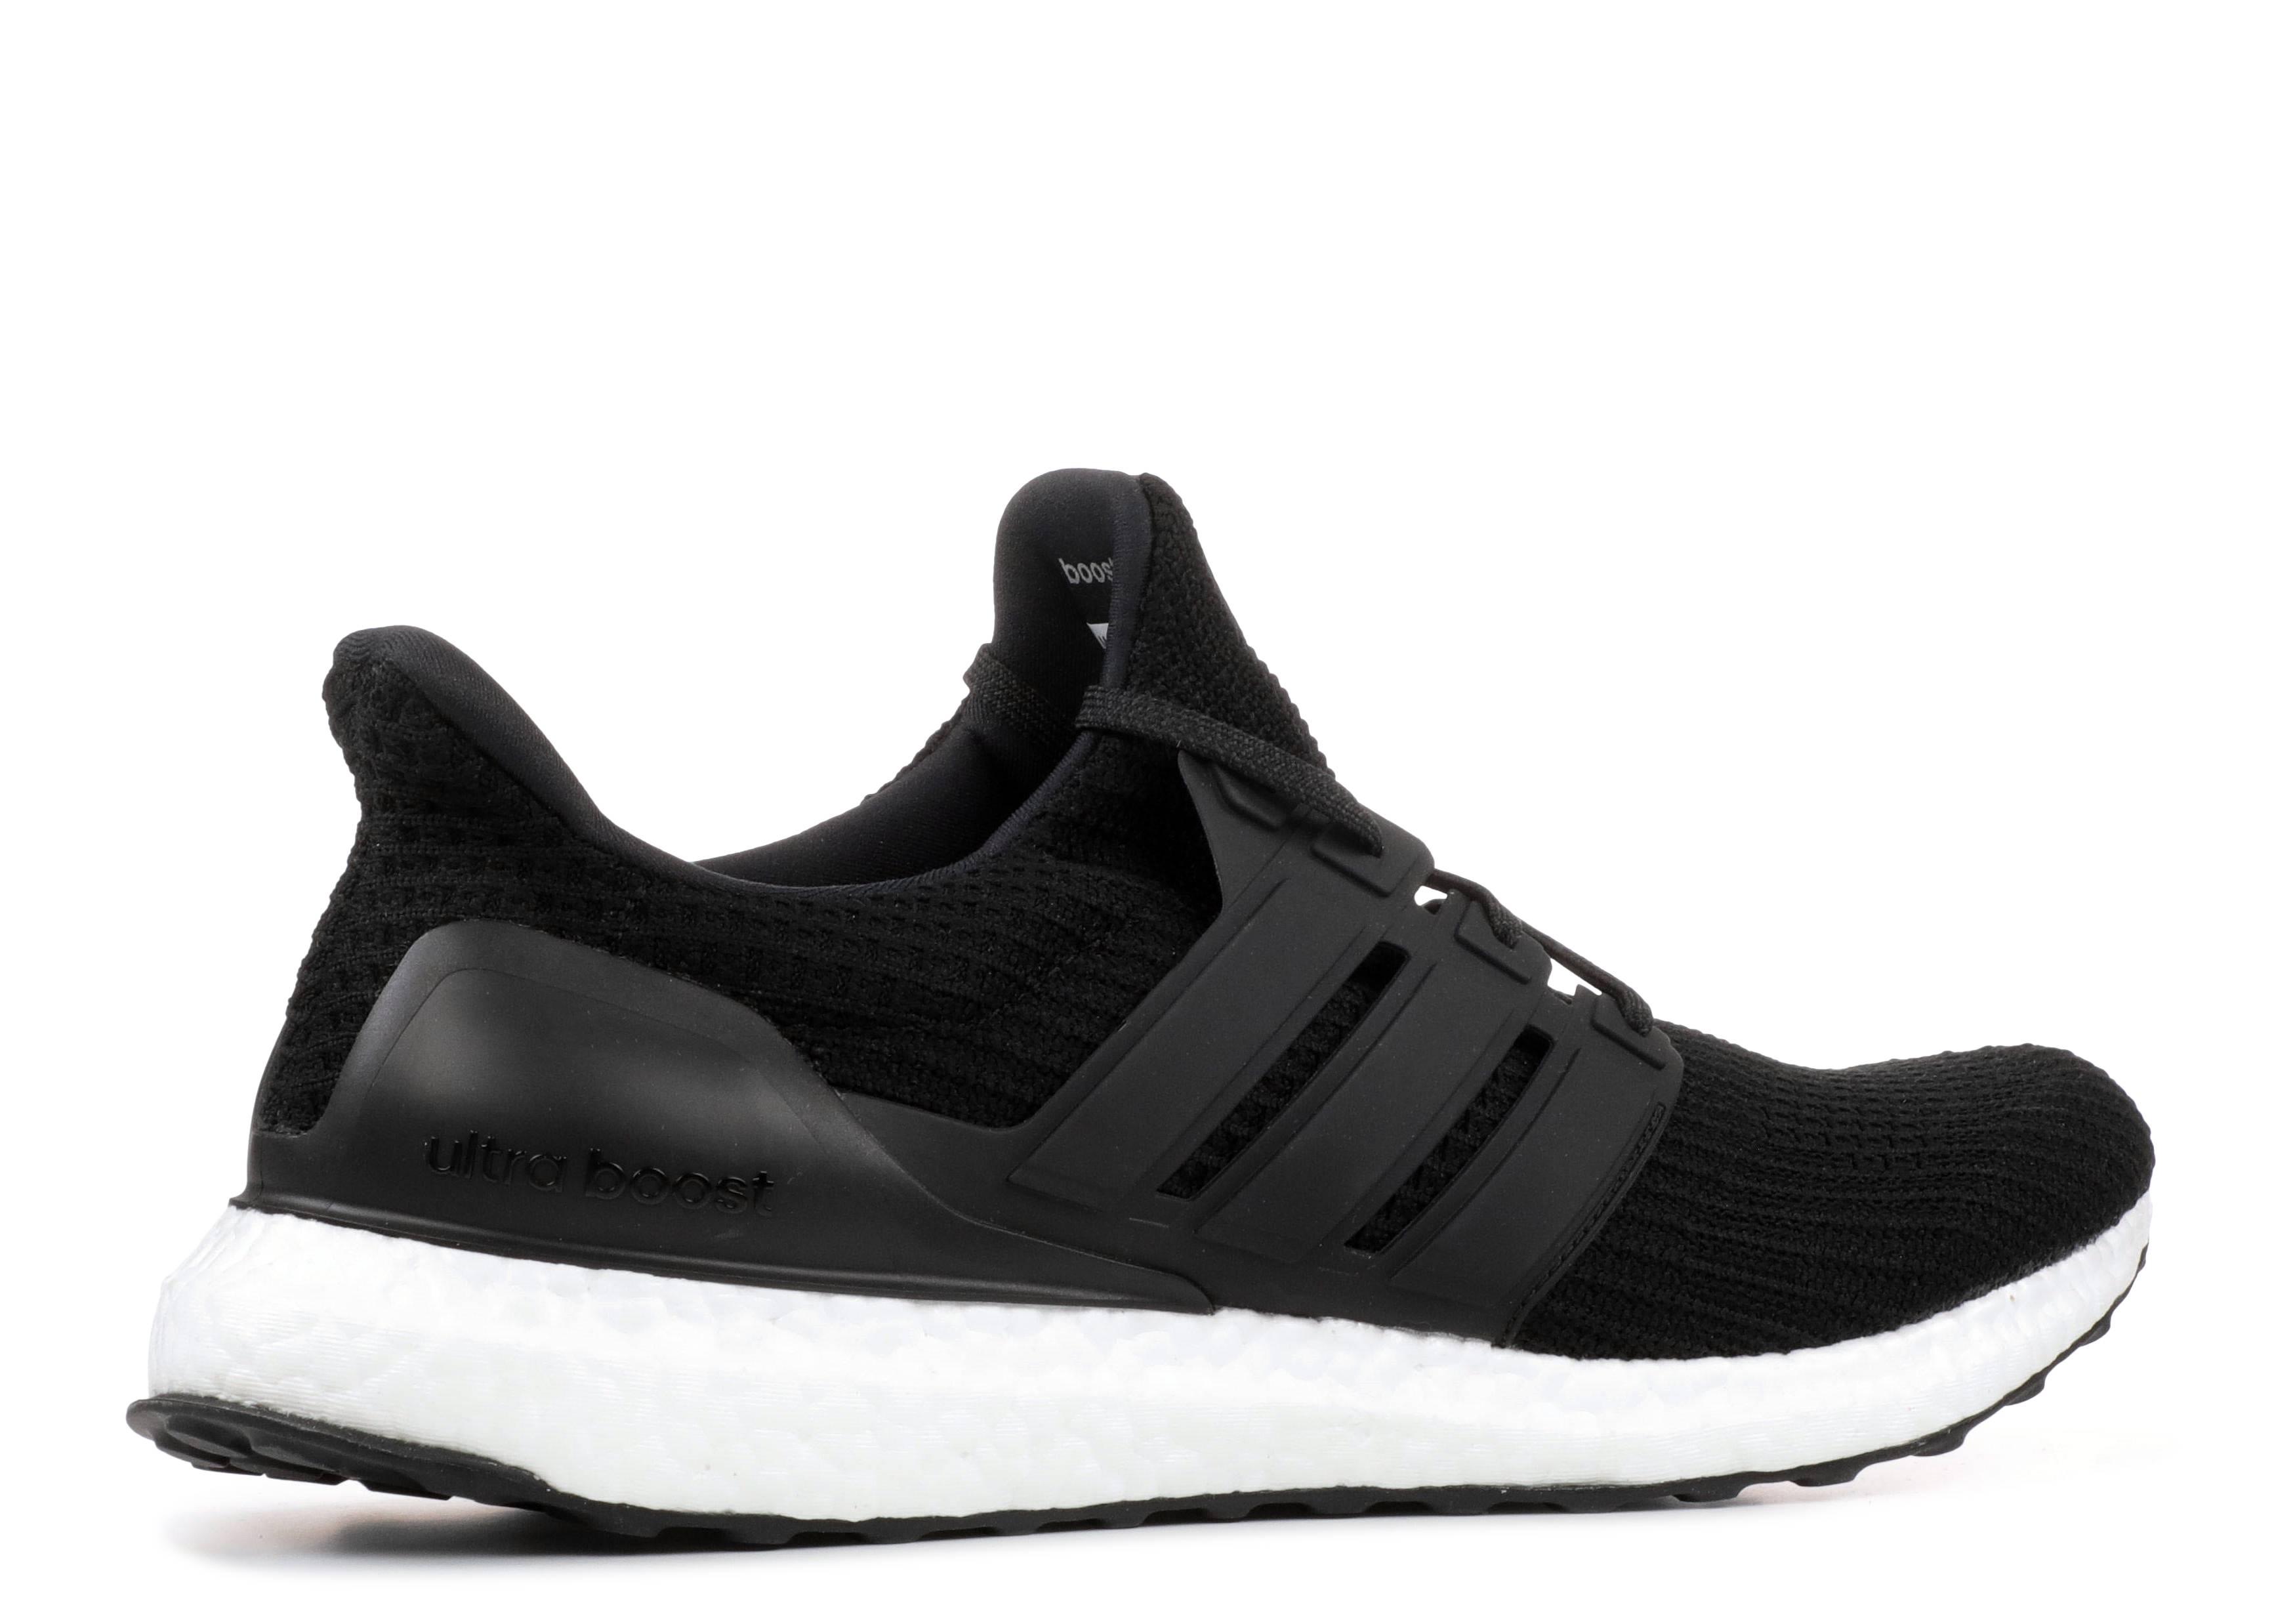 UltraBoost - Adidas - bb6166 - core black core black white  1ee37e9fc